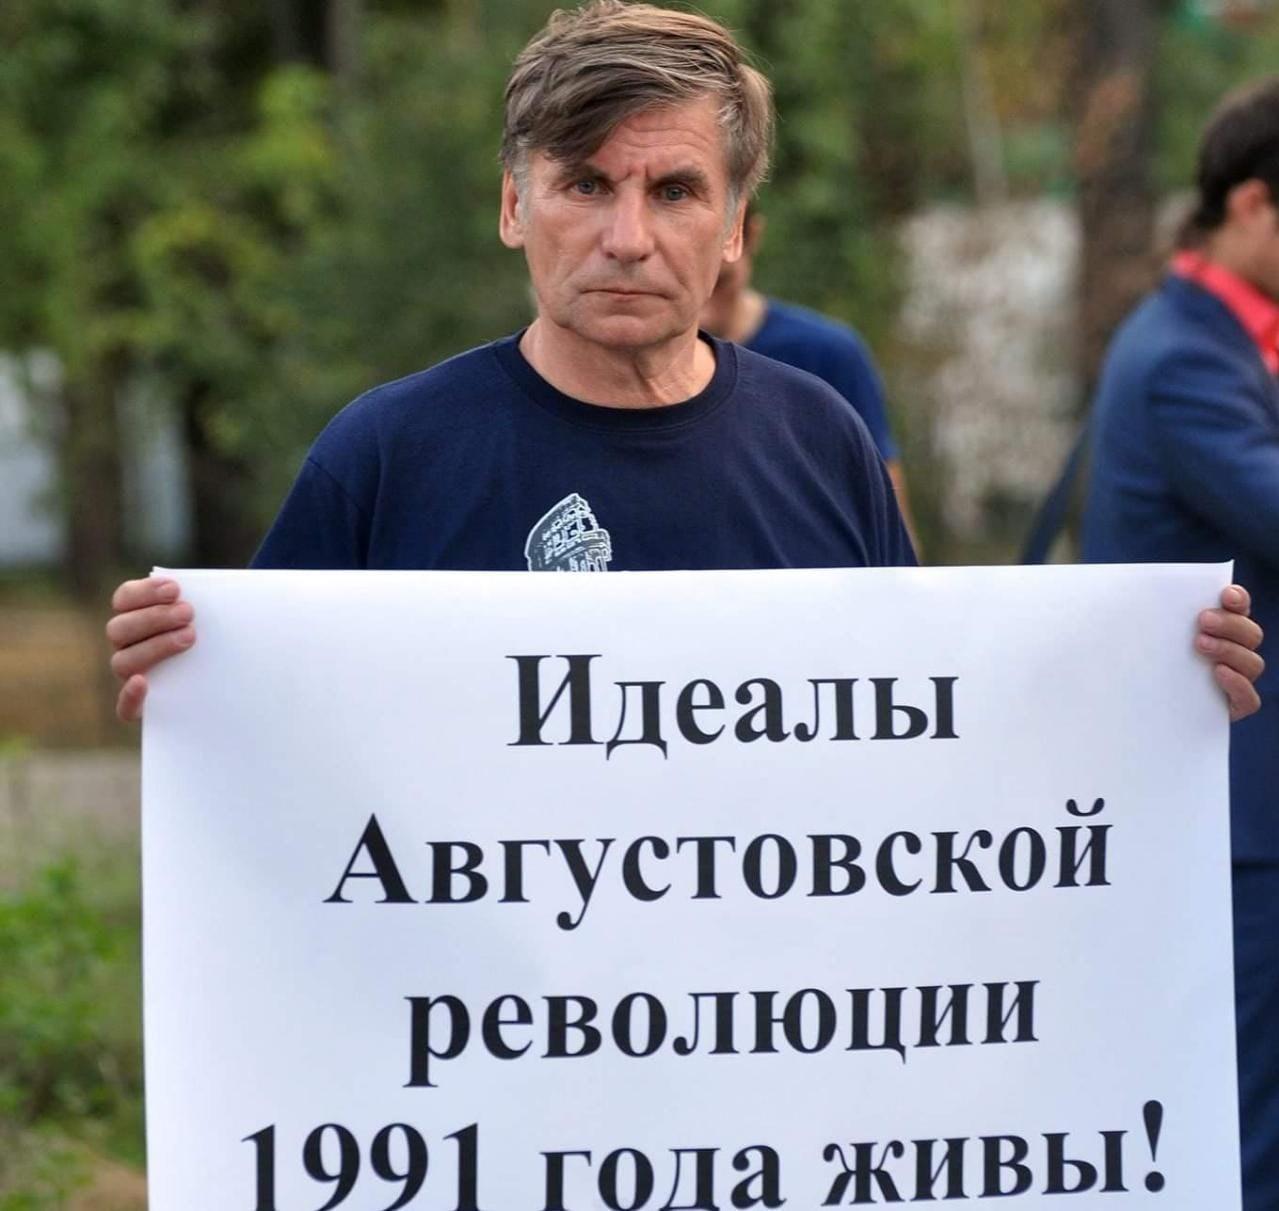 Фарит Закиев / Фото: Others